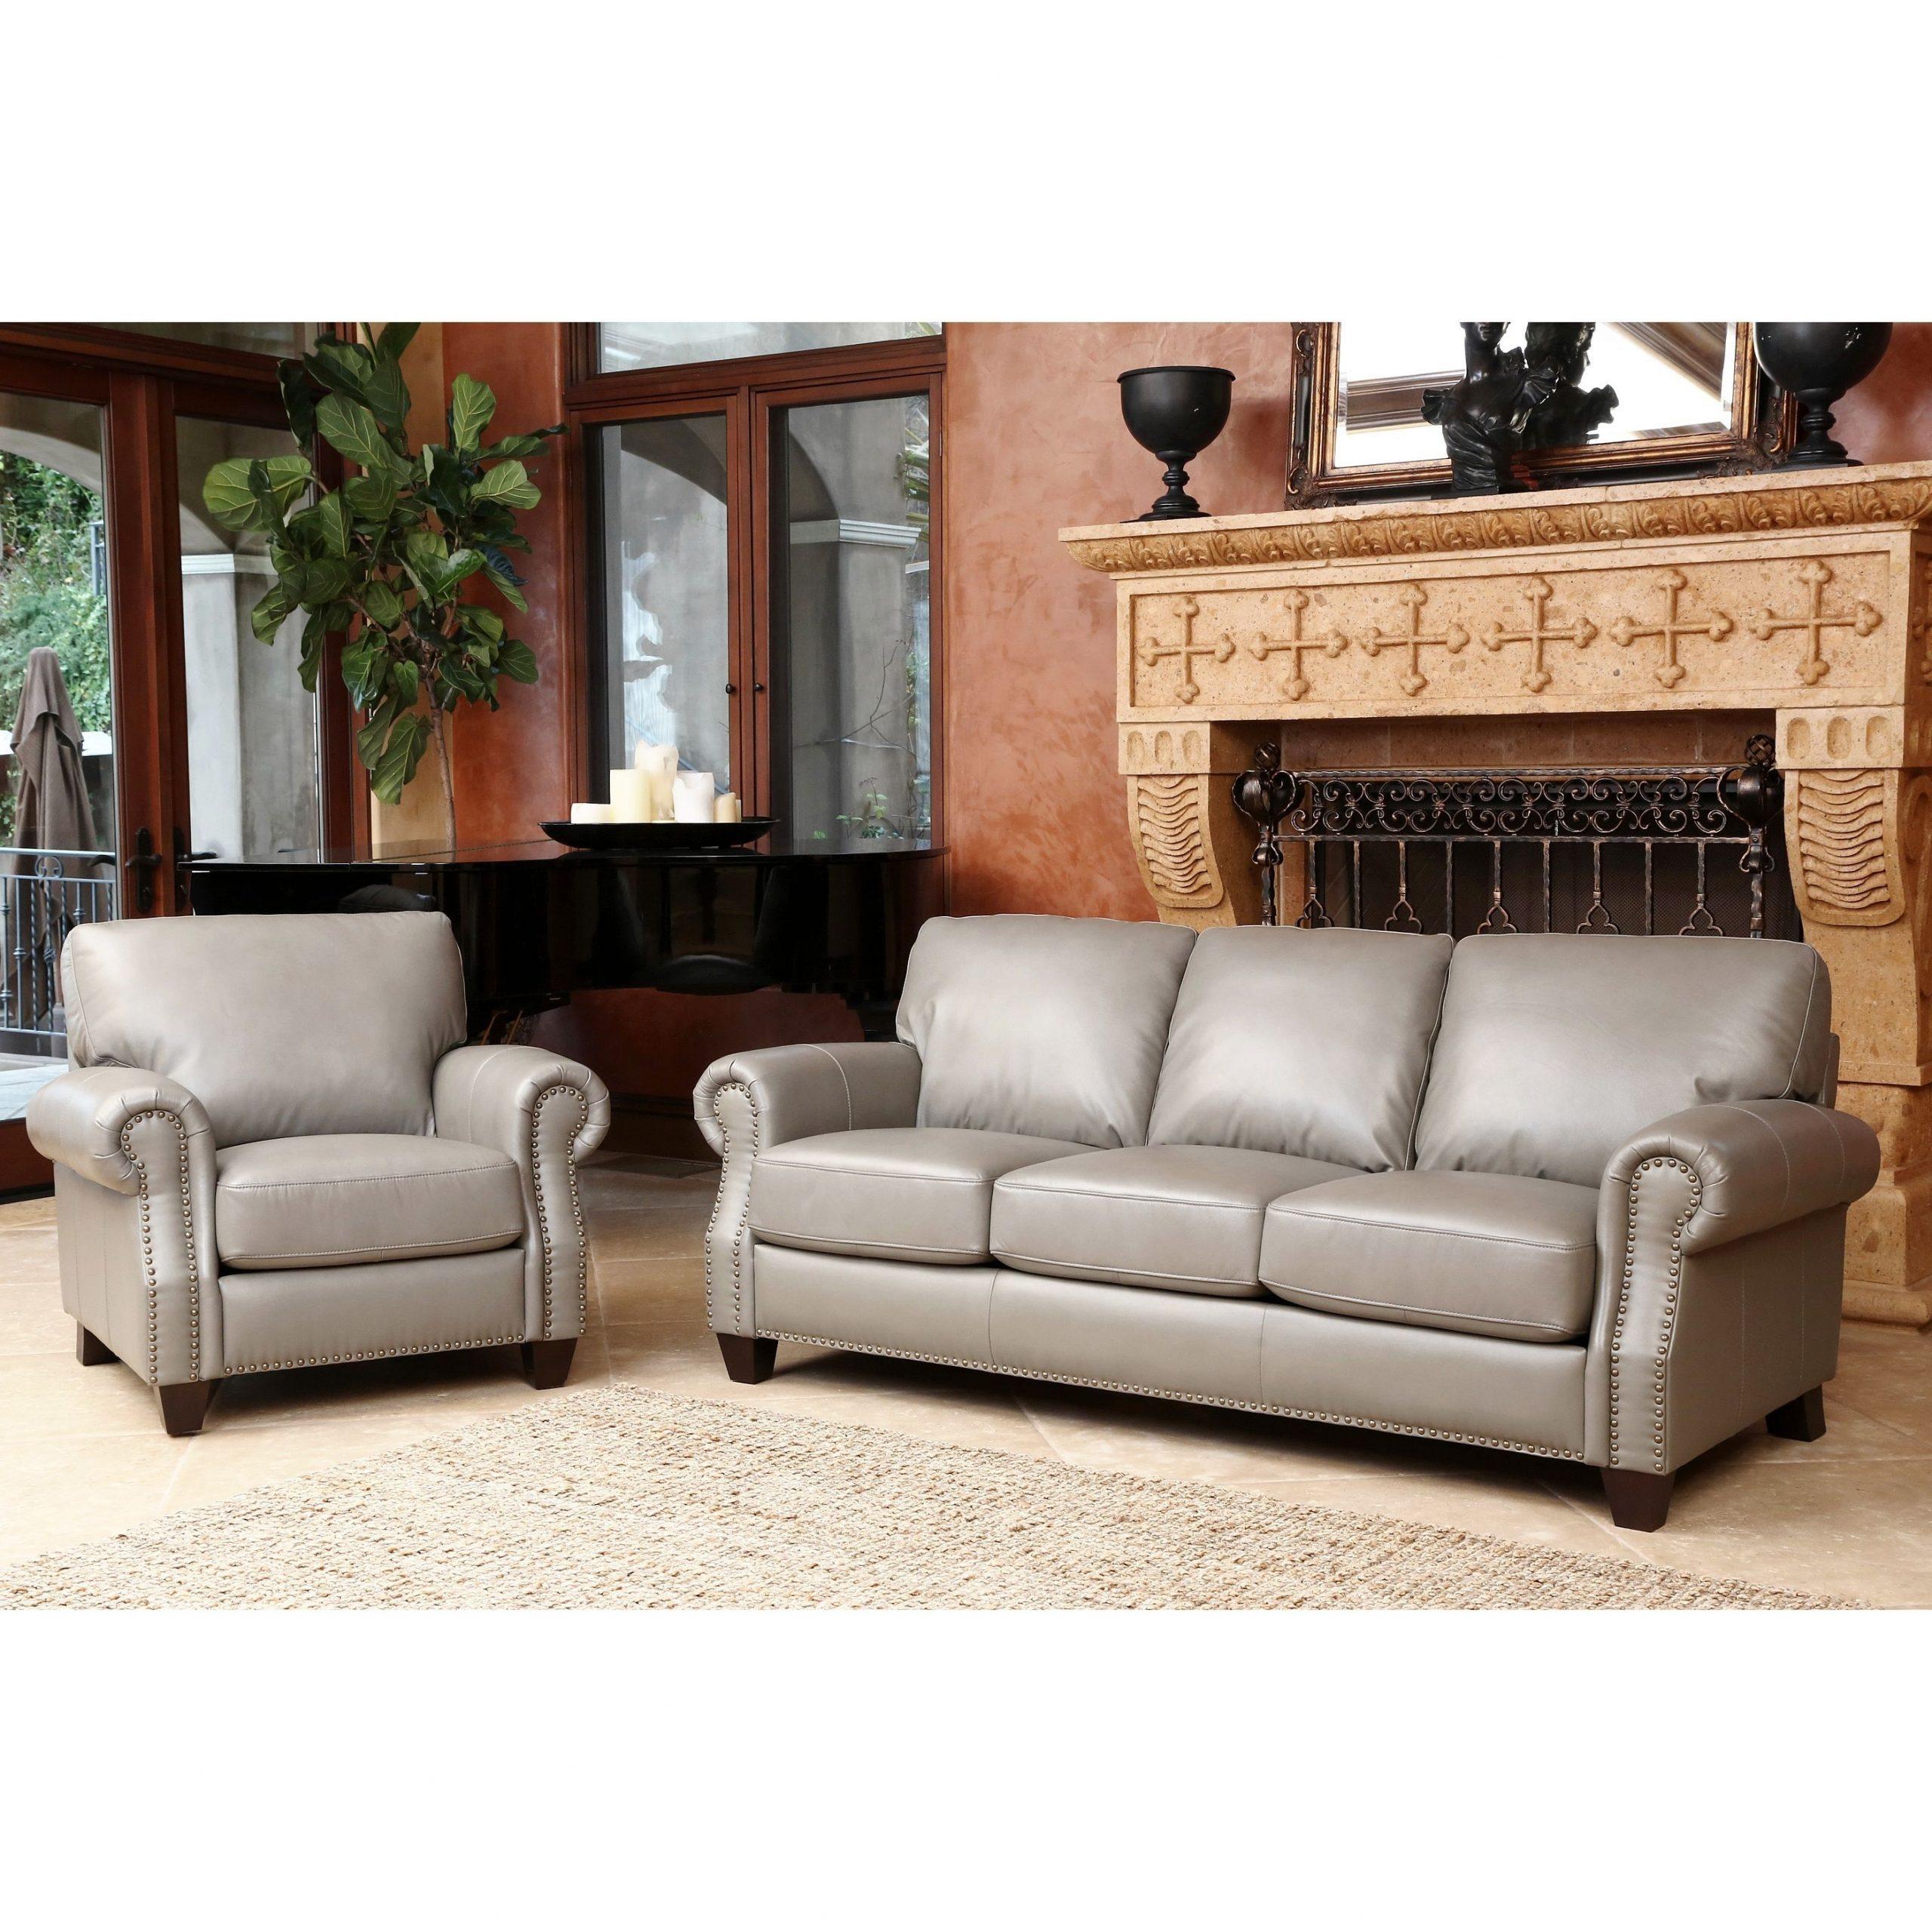 Abbyson Landon Top Grain Leather 2 Piece Living Room Set pertaining to Best Living Room Sofa Sets